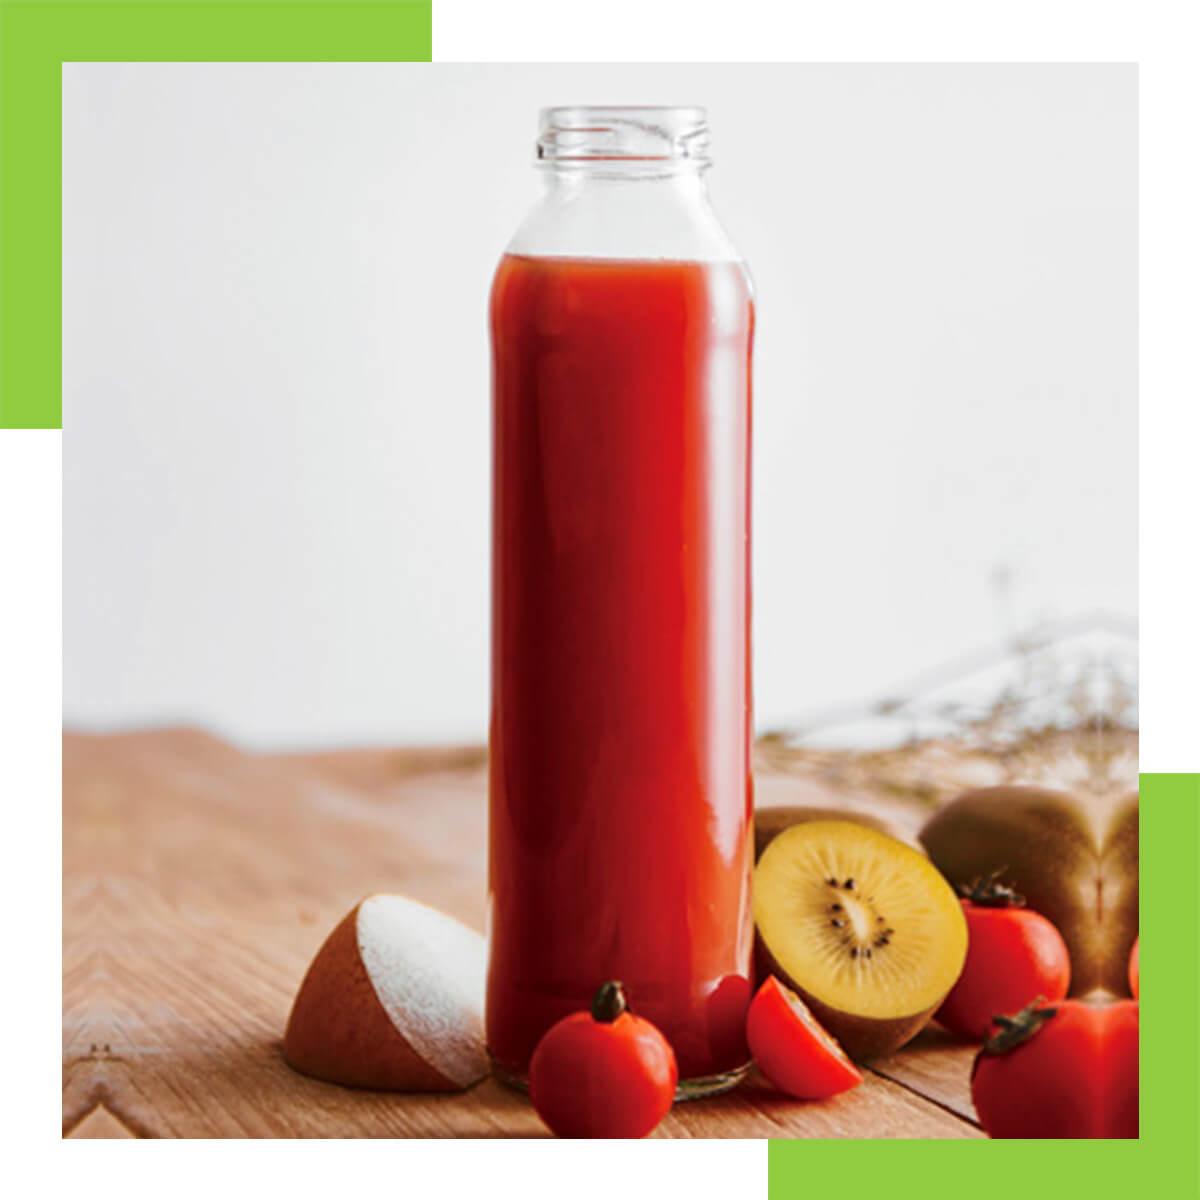 The Skinny Juice